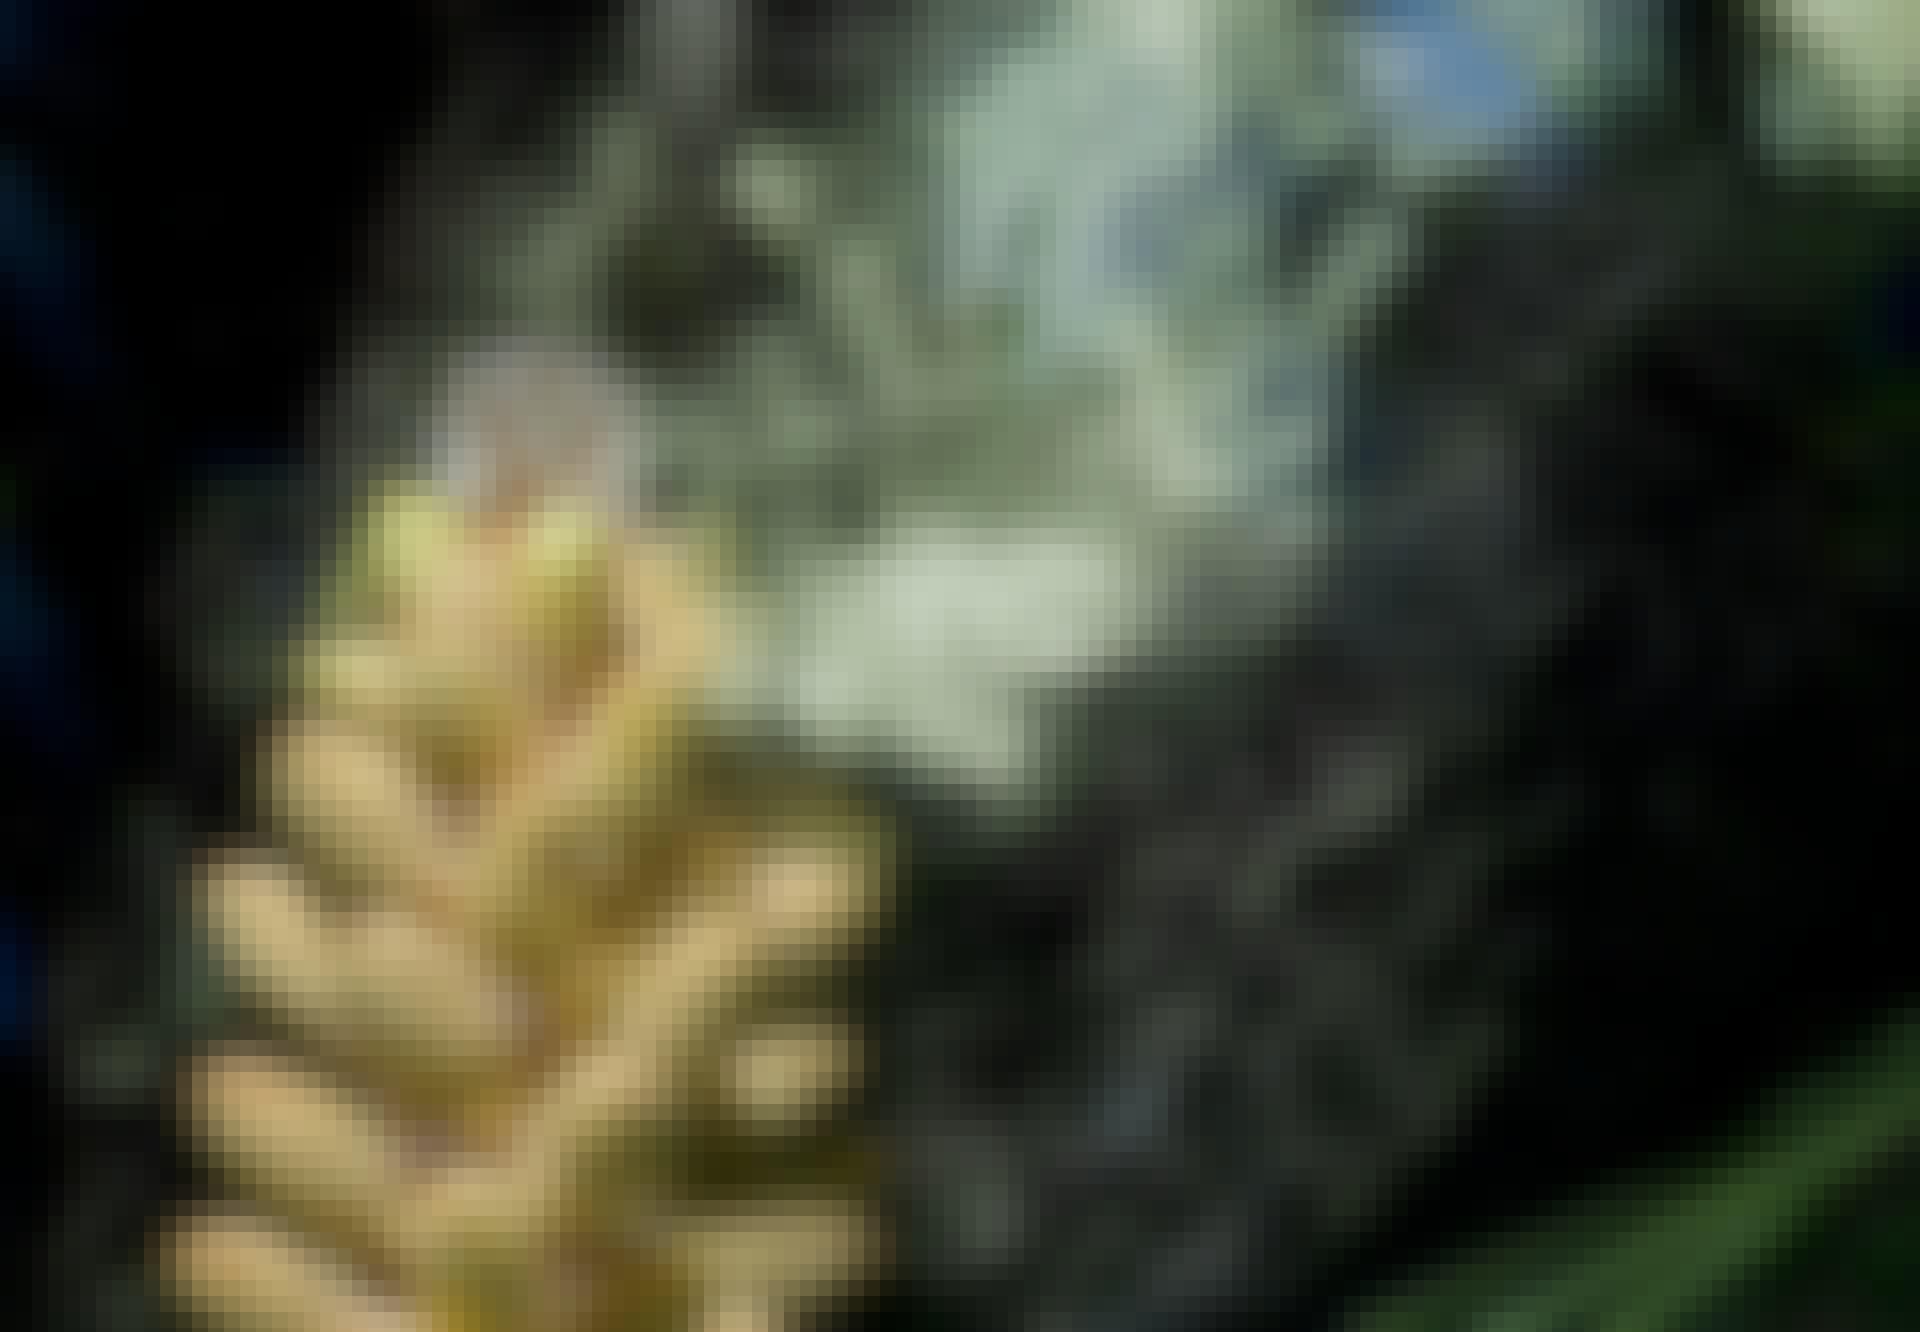 siitepölyallergia heinänuha